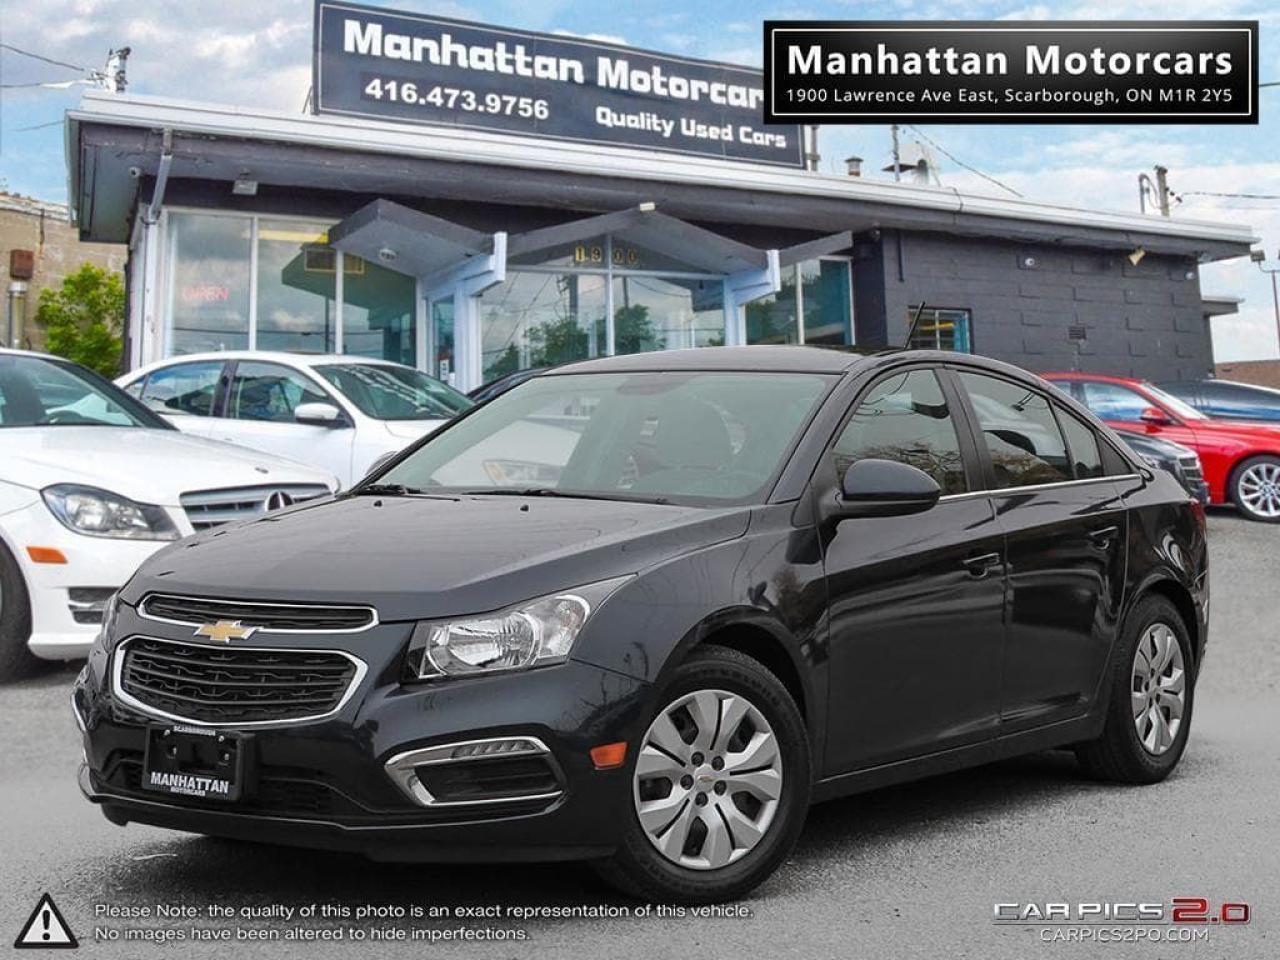 2015 Chevrolet Cruze LT AUTO |BLUETOOTH|CAMERA|WARRANTY|22000KM